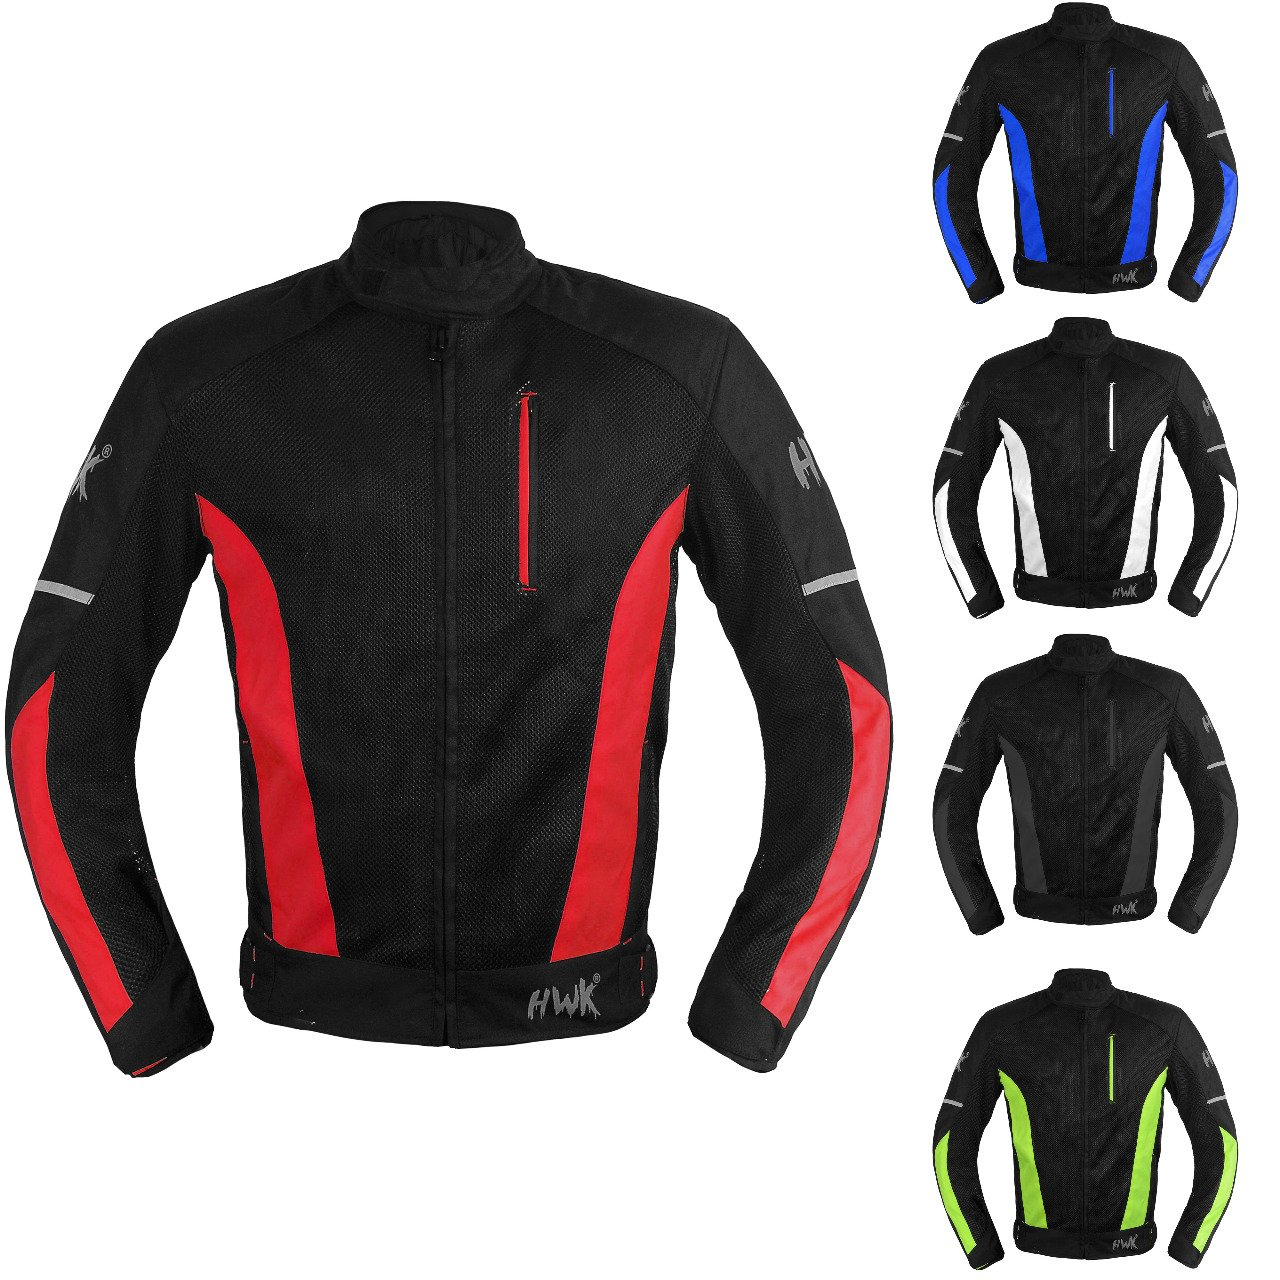 Mesh Motorcycle Jacket Textile Motorbike Summer Biker Air Jacket CE ARMOURED BREATHABLE Medium, Red